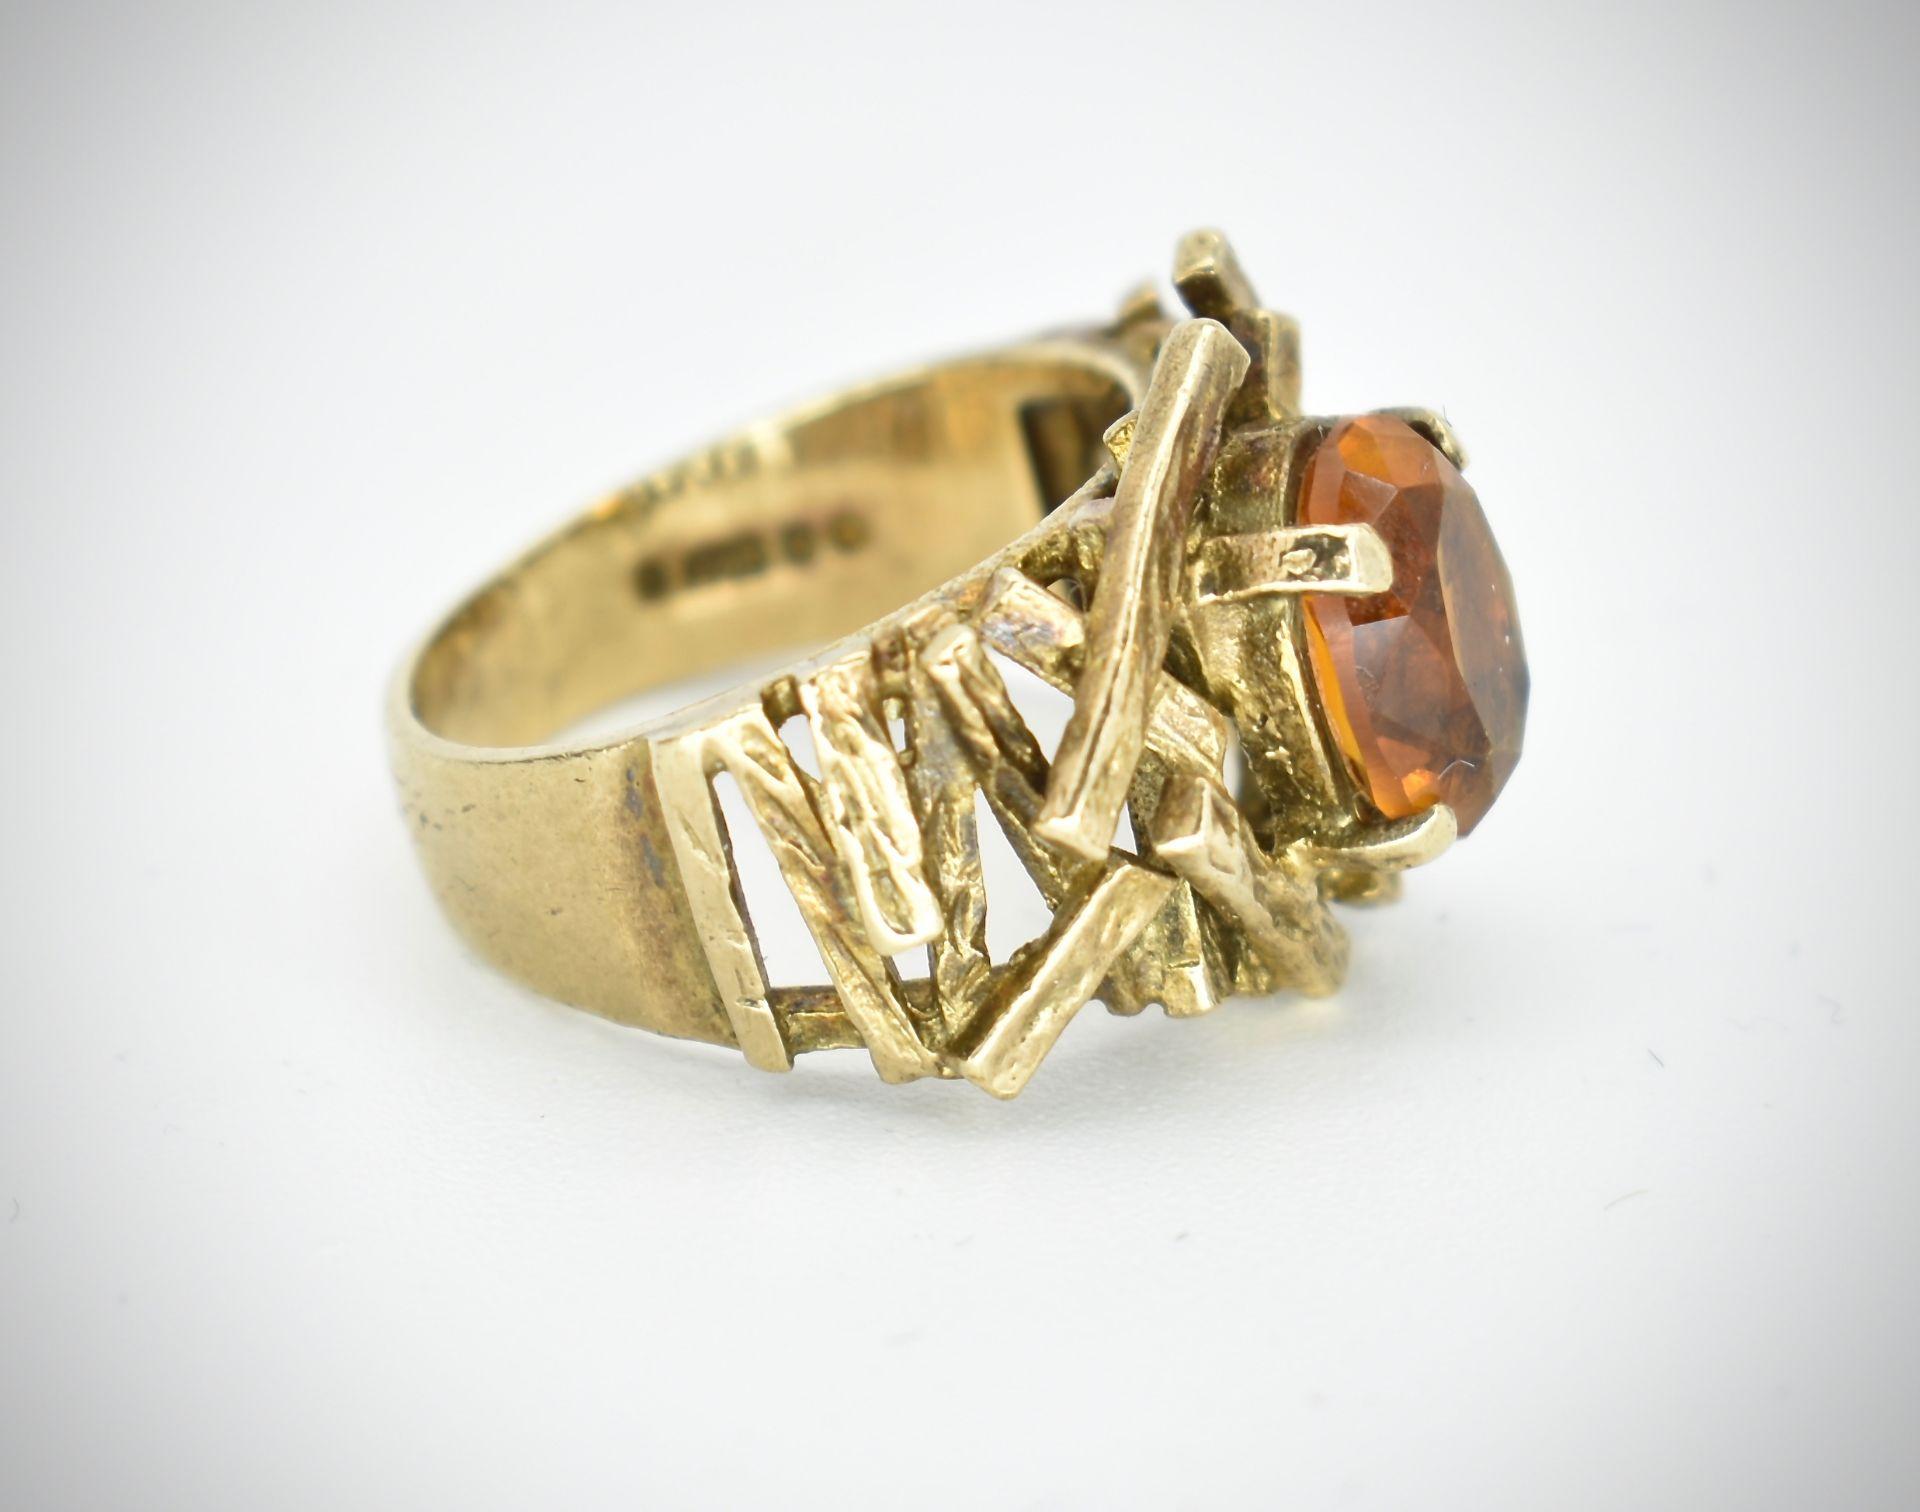 9ct Gold & Citrine Hallmarked 1960's Designer Ring - - Image 4 of 6